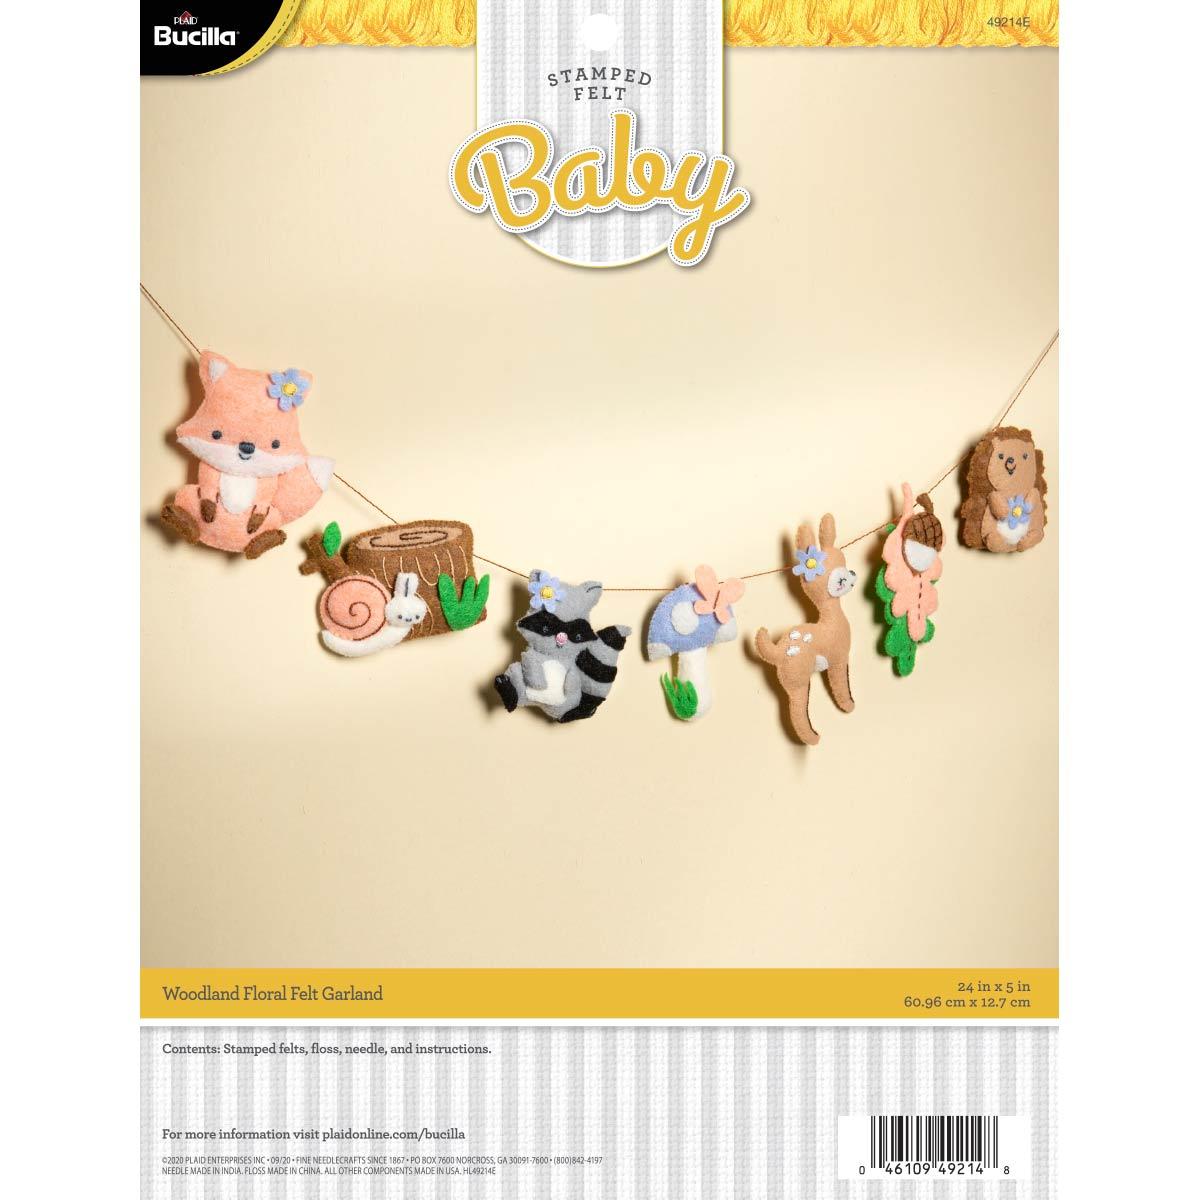 Bucilla ® Baby - Felt - Crib Ensembles - Woodland Floral - Garland - 49214E